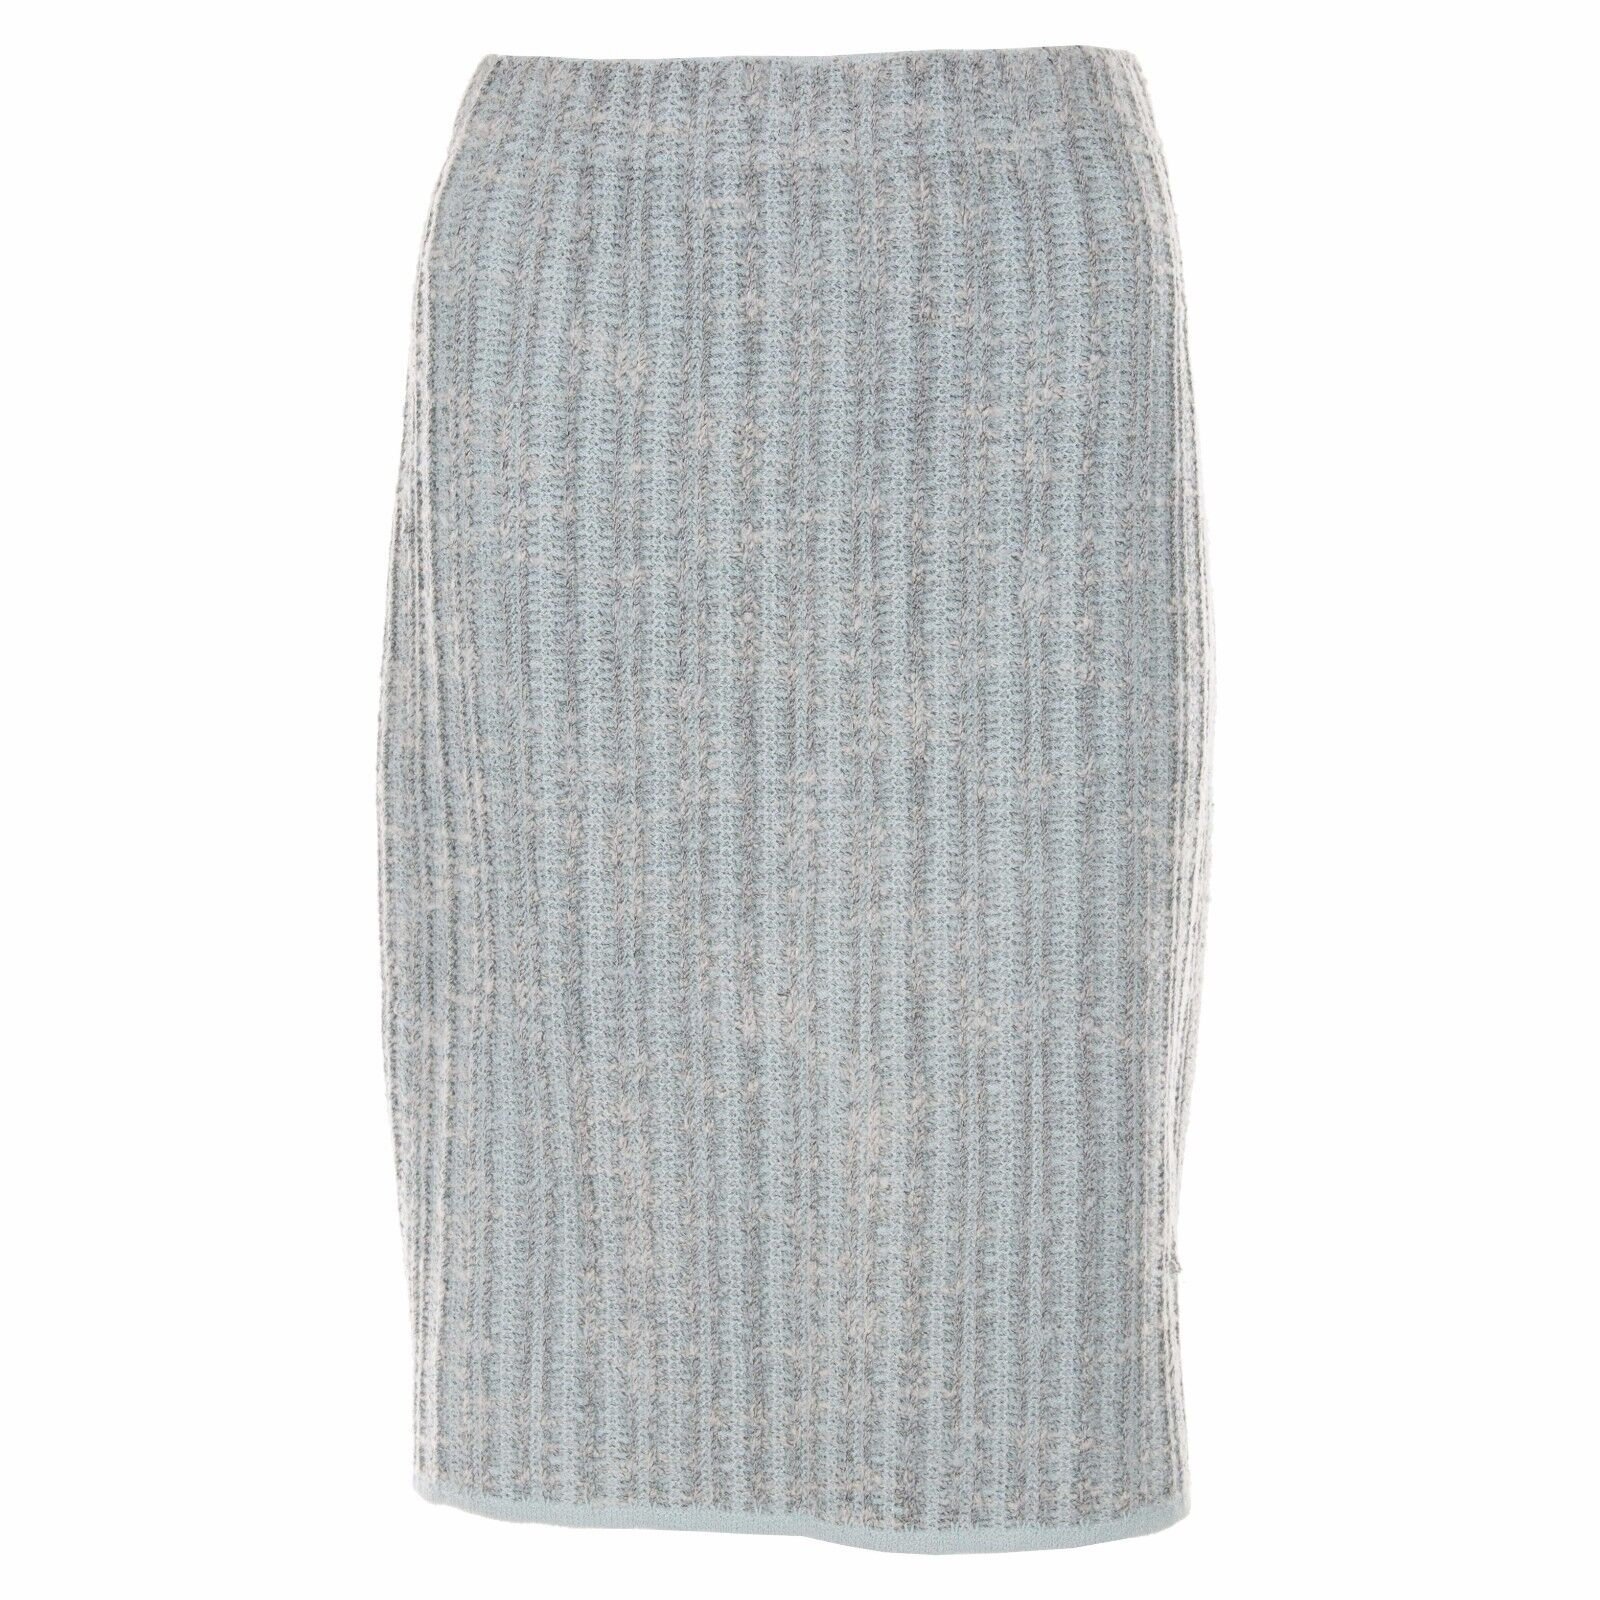 68942dade NWT St. Green Knit Pencil Skirt Size 2 Seafoam John nwwwix5172-Skirts